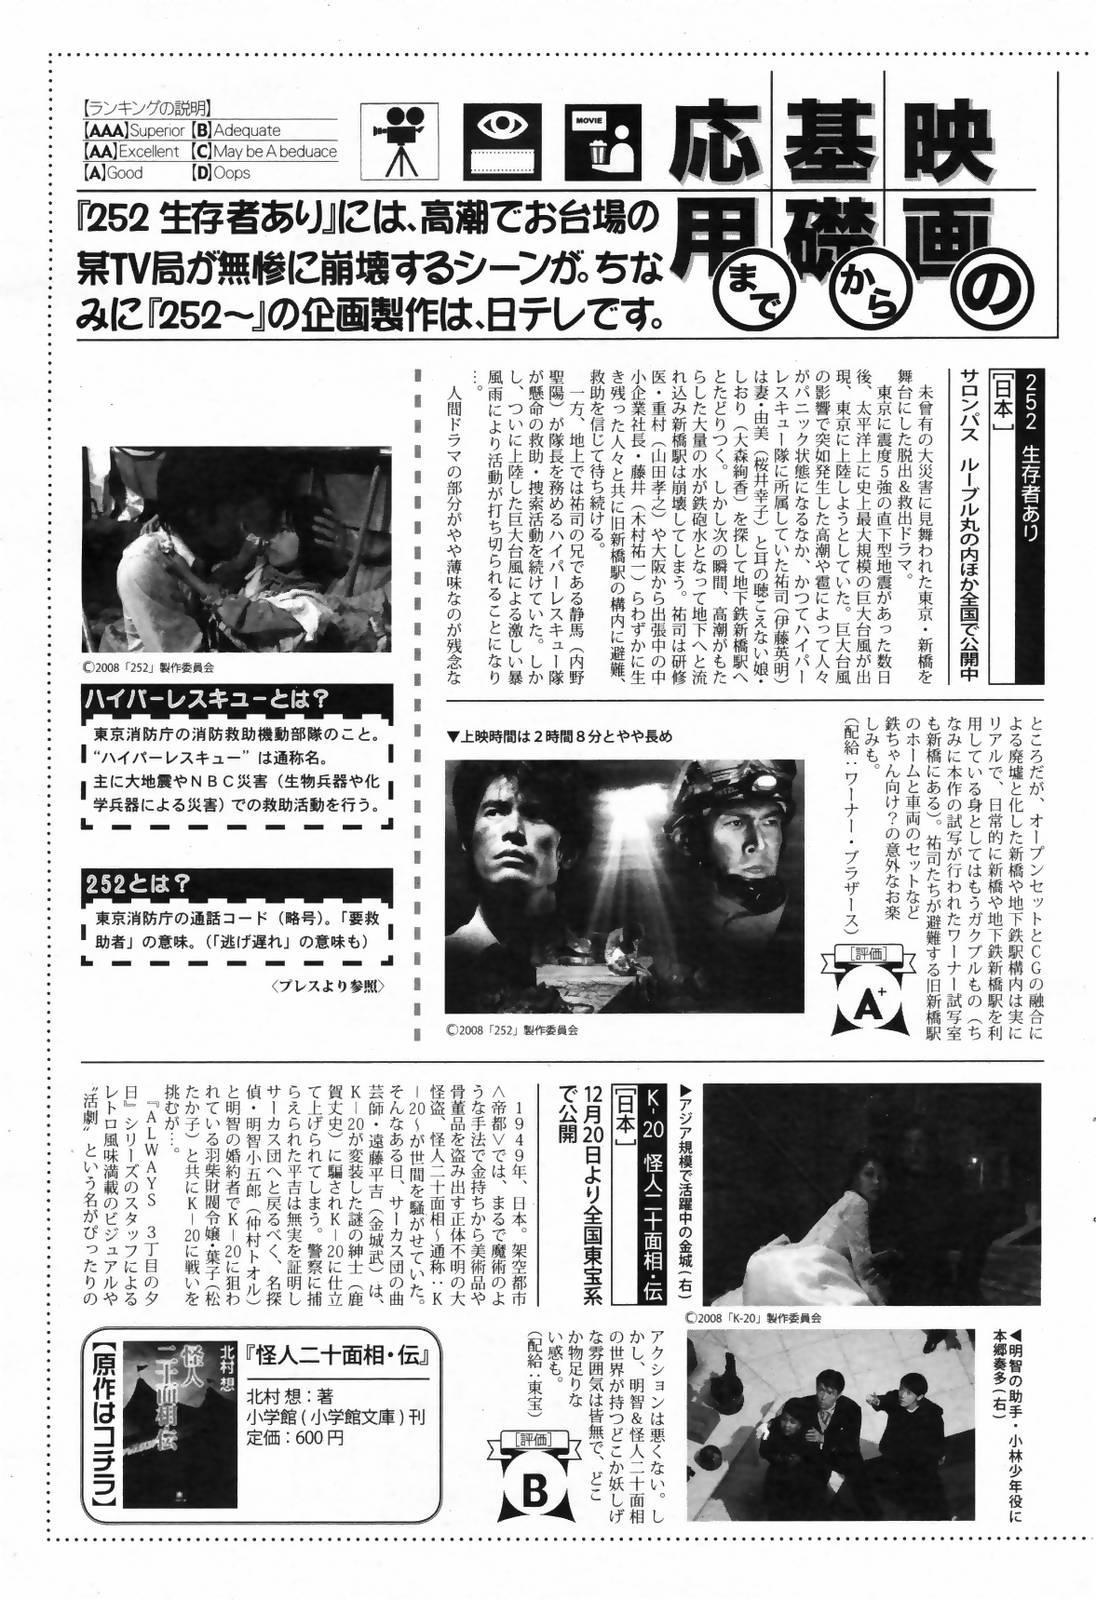 Manga Bangaichi 2009-02 Vol. 234 76